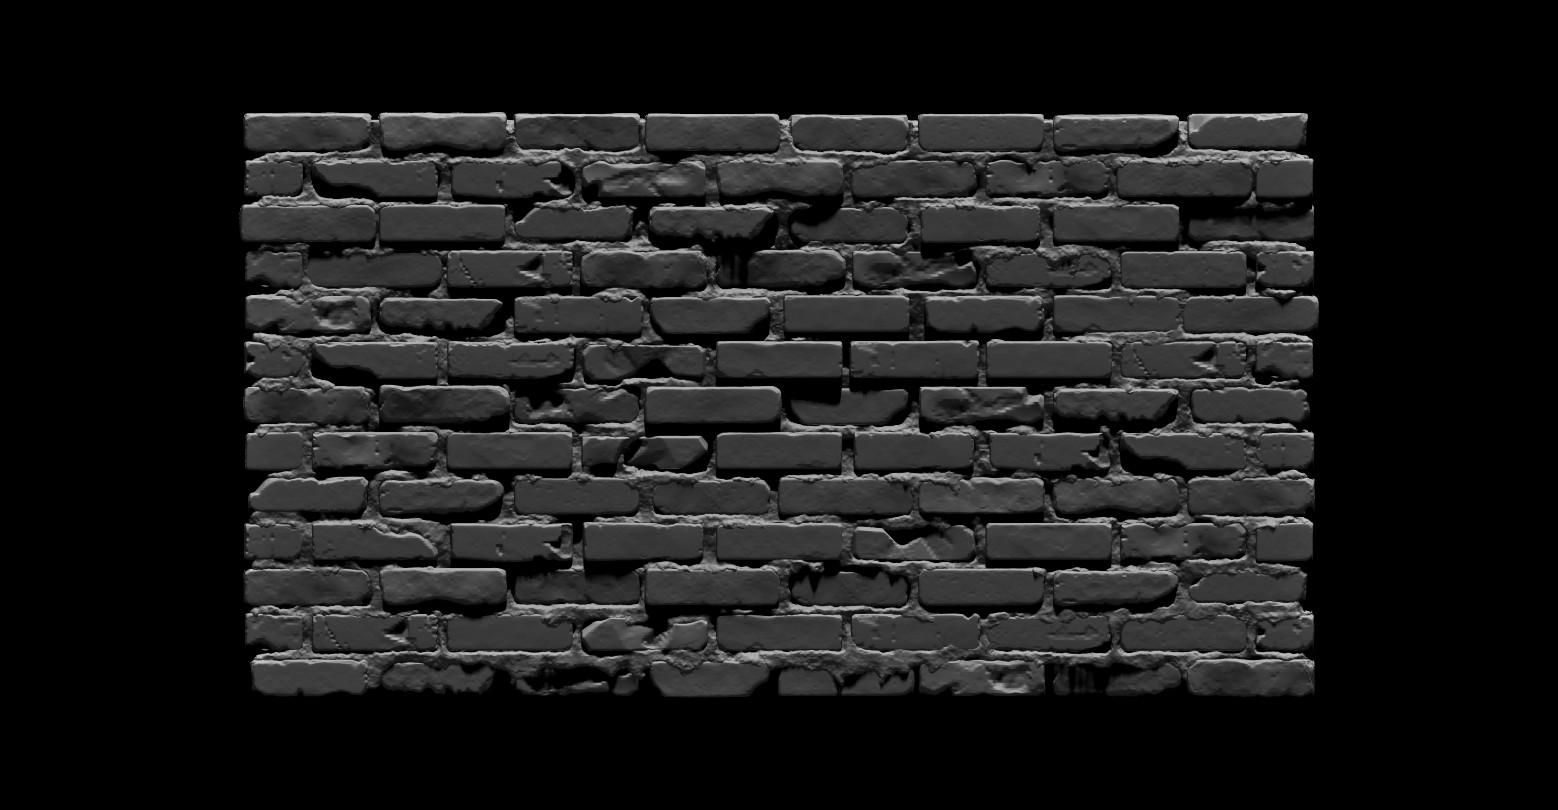 Bela csampai brick wall 01 render zb 02